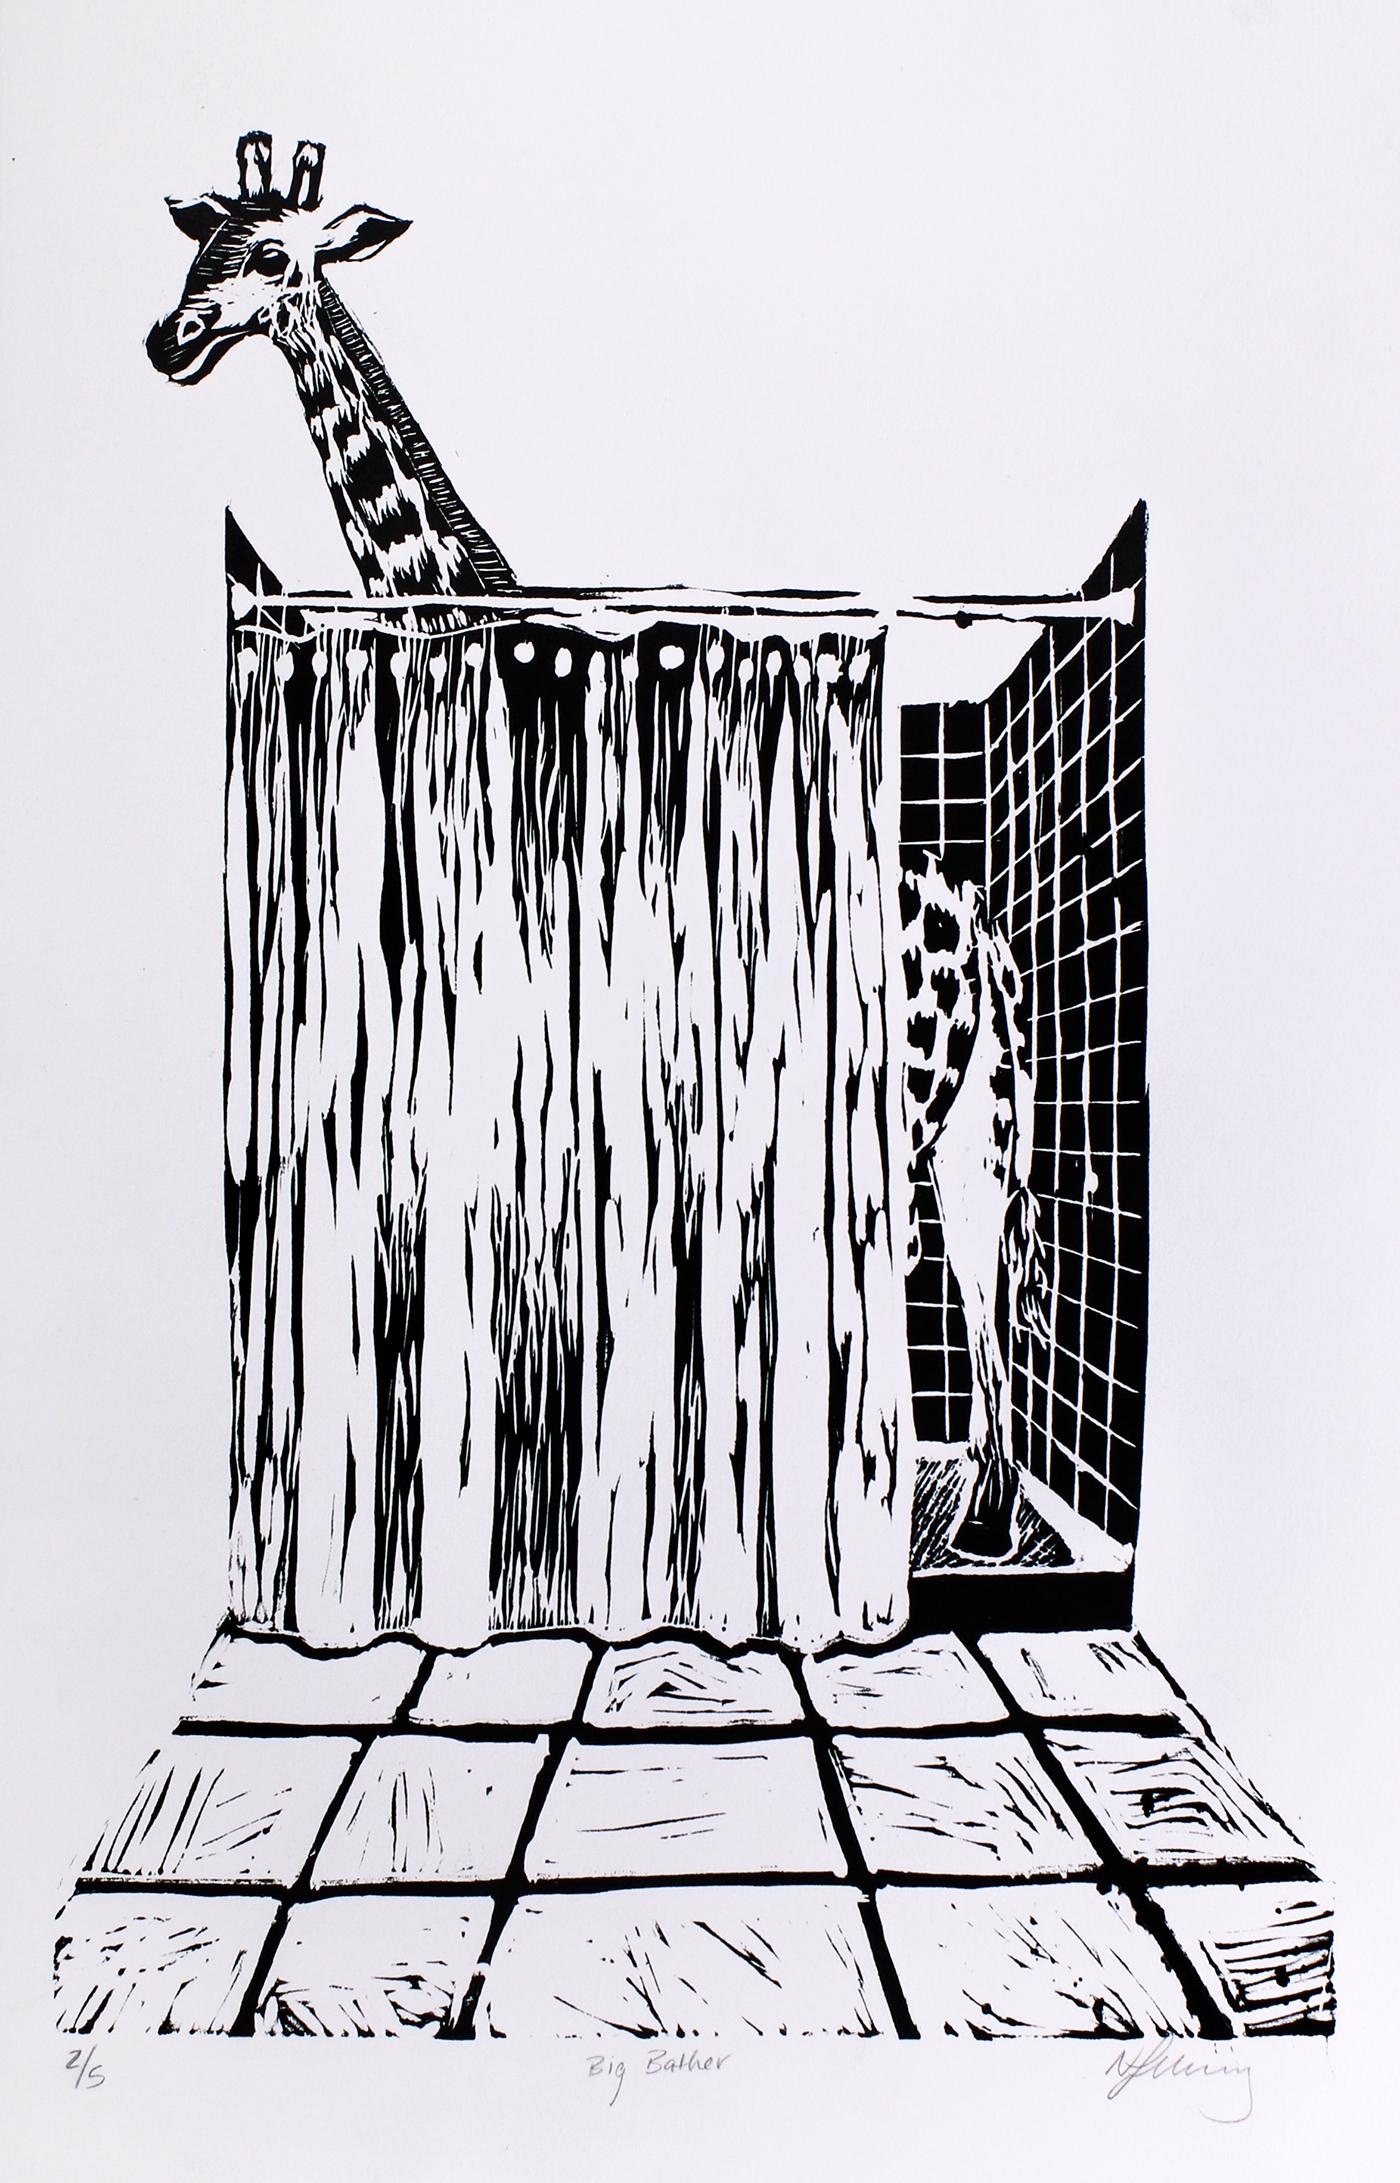 printmaking linoleum giraffe bath SHOWER print black White humor